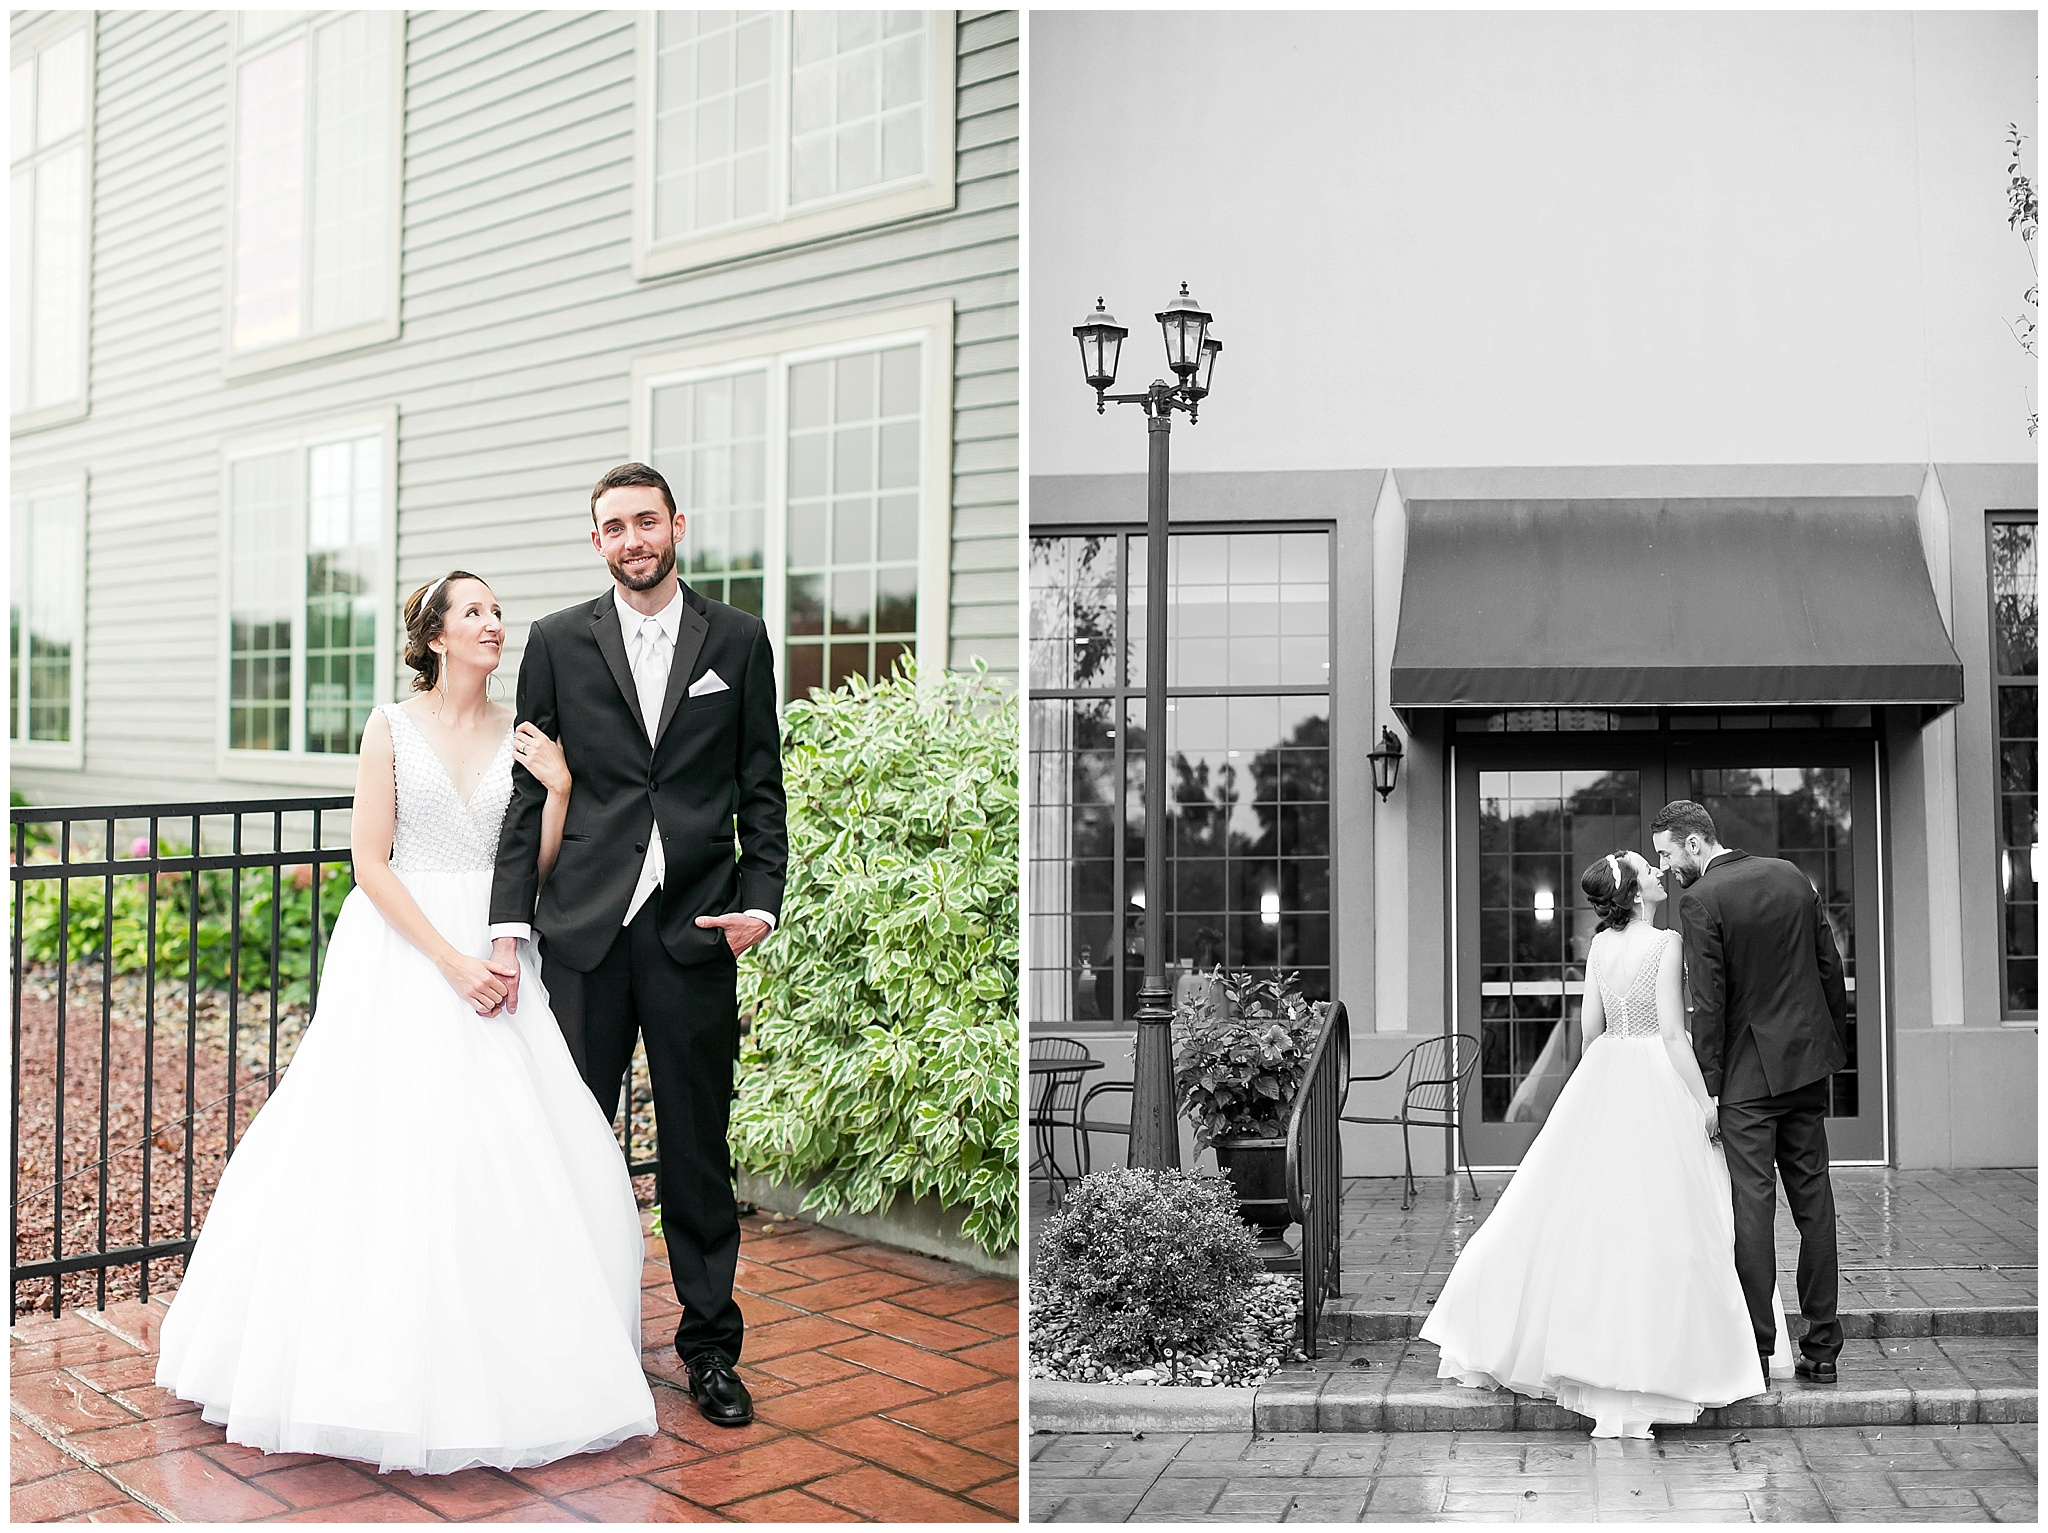 bridgewood_resort_wedding_neenah_wisconsin_0355.jpg